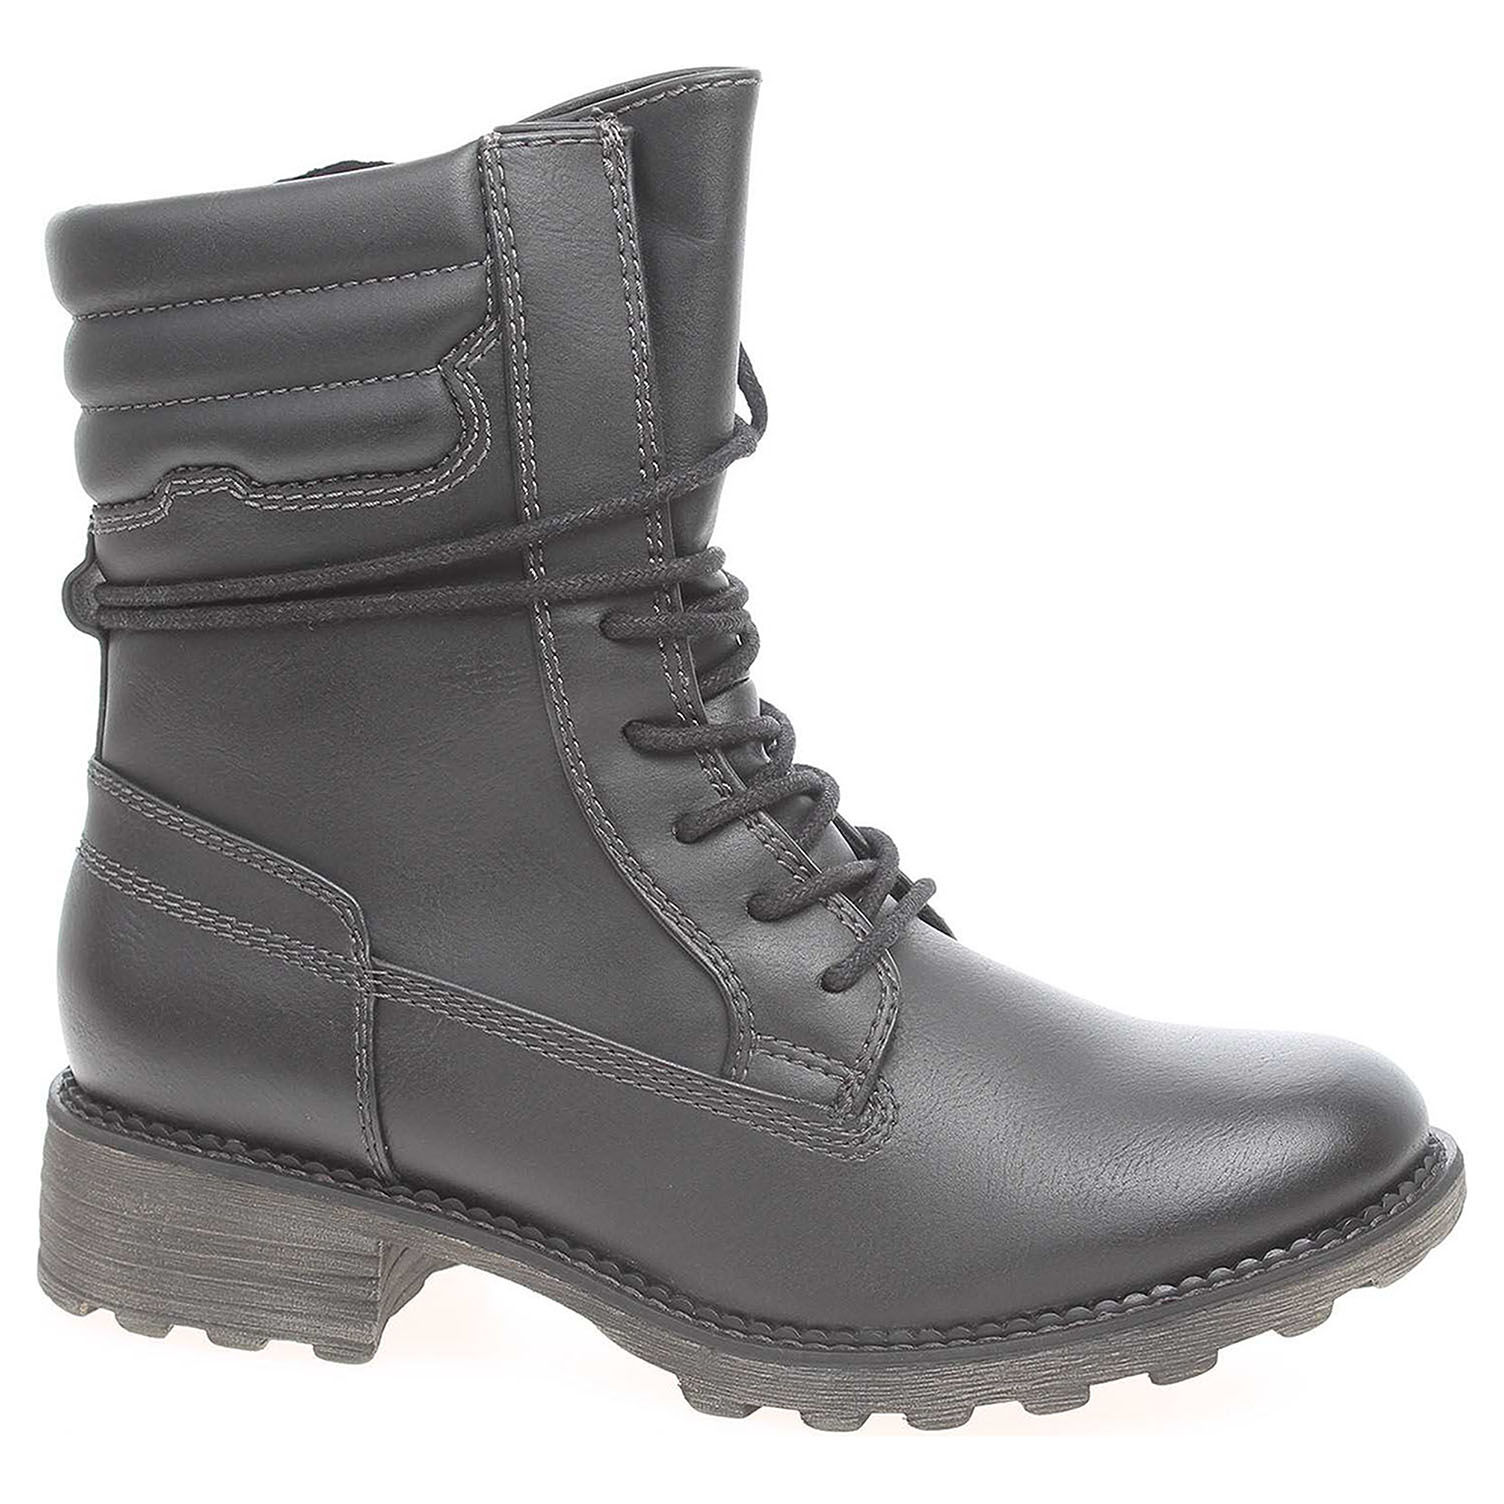 33d96e12138c2 Dámská kotníková obuv Tamaris 1-26206-29 černé | Rejnok obuv